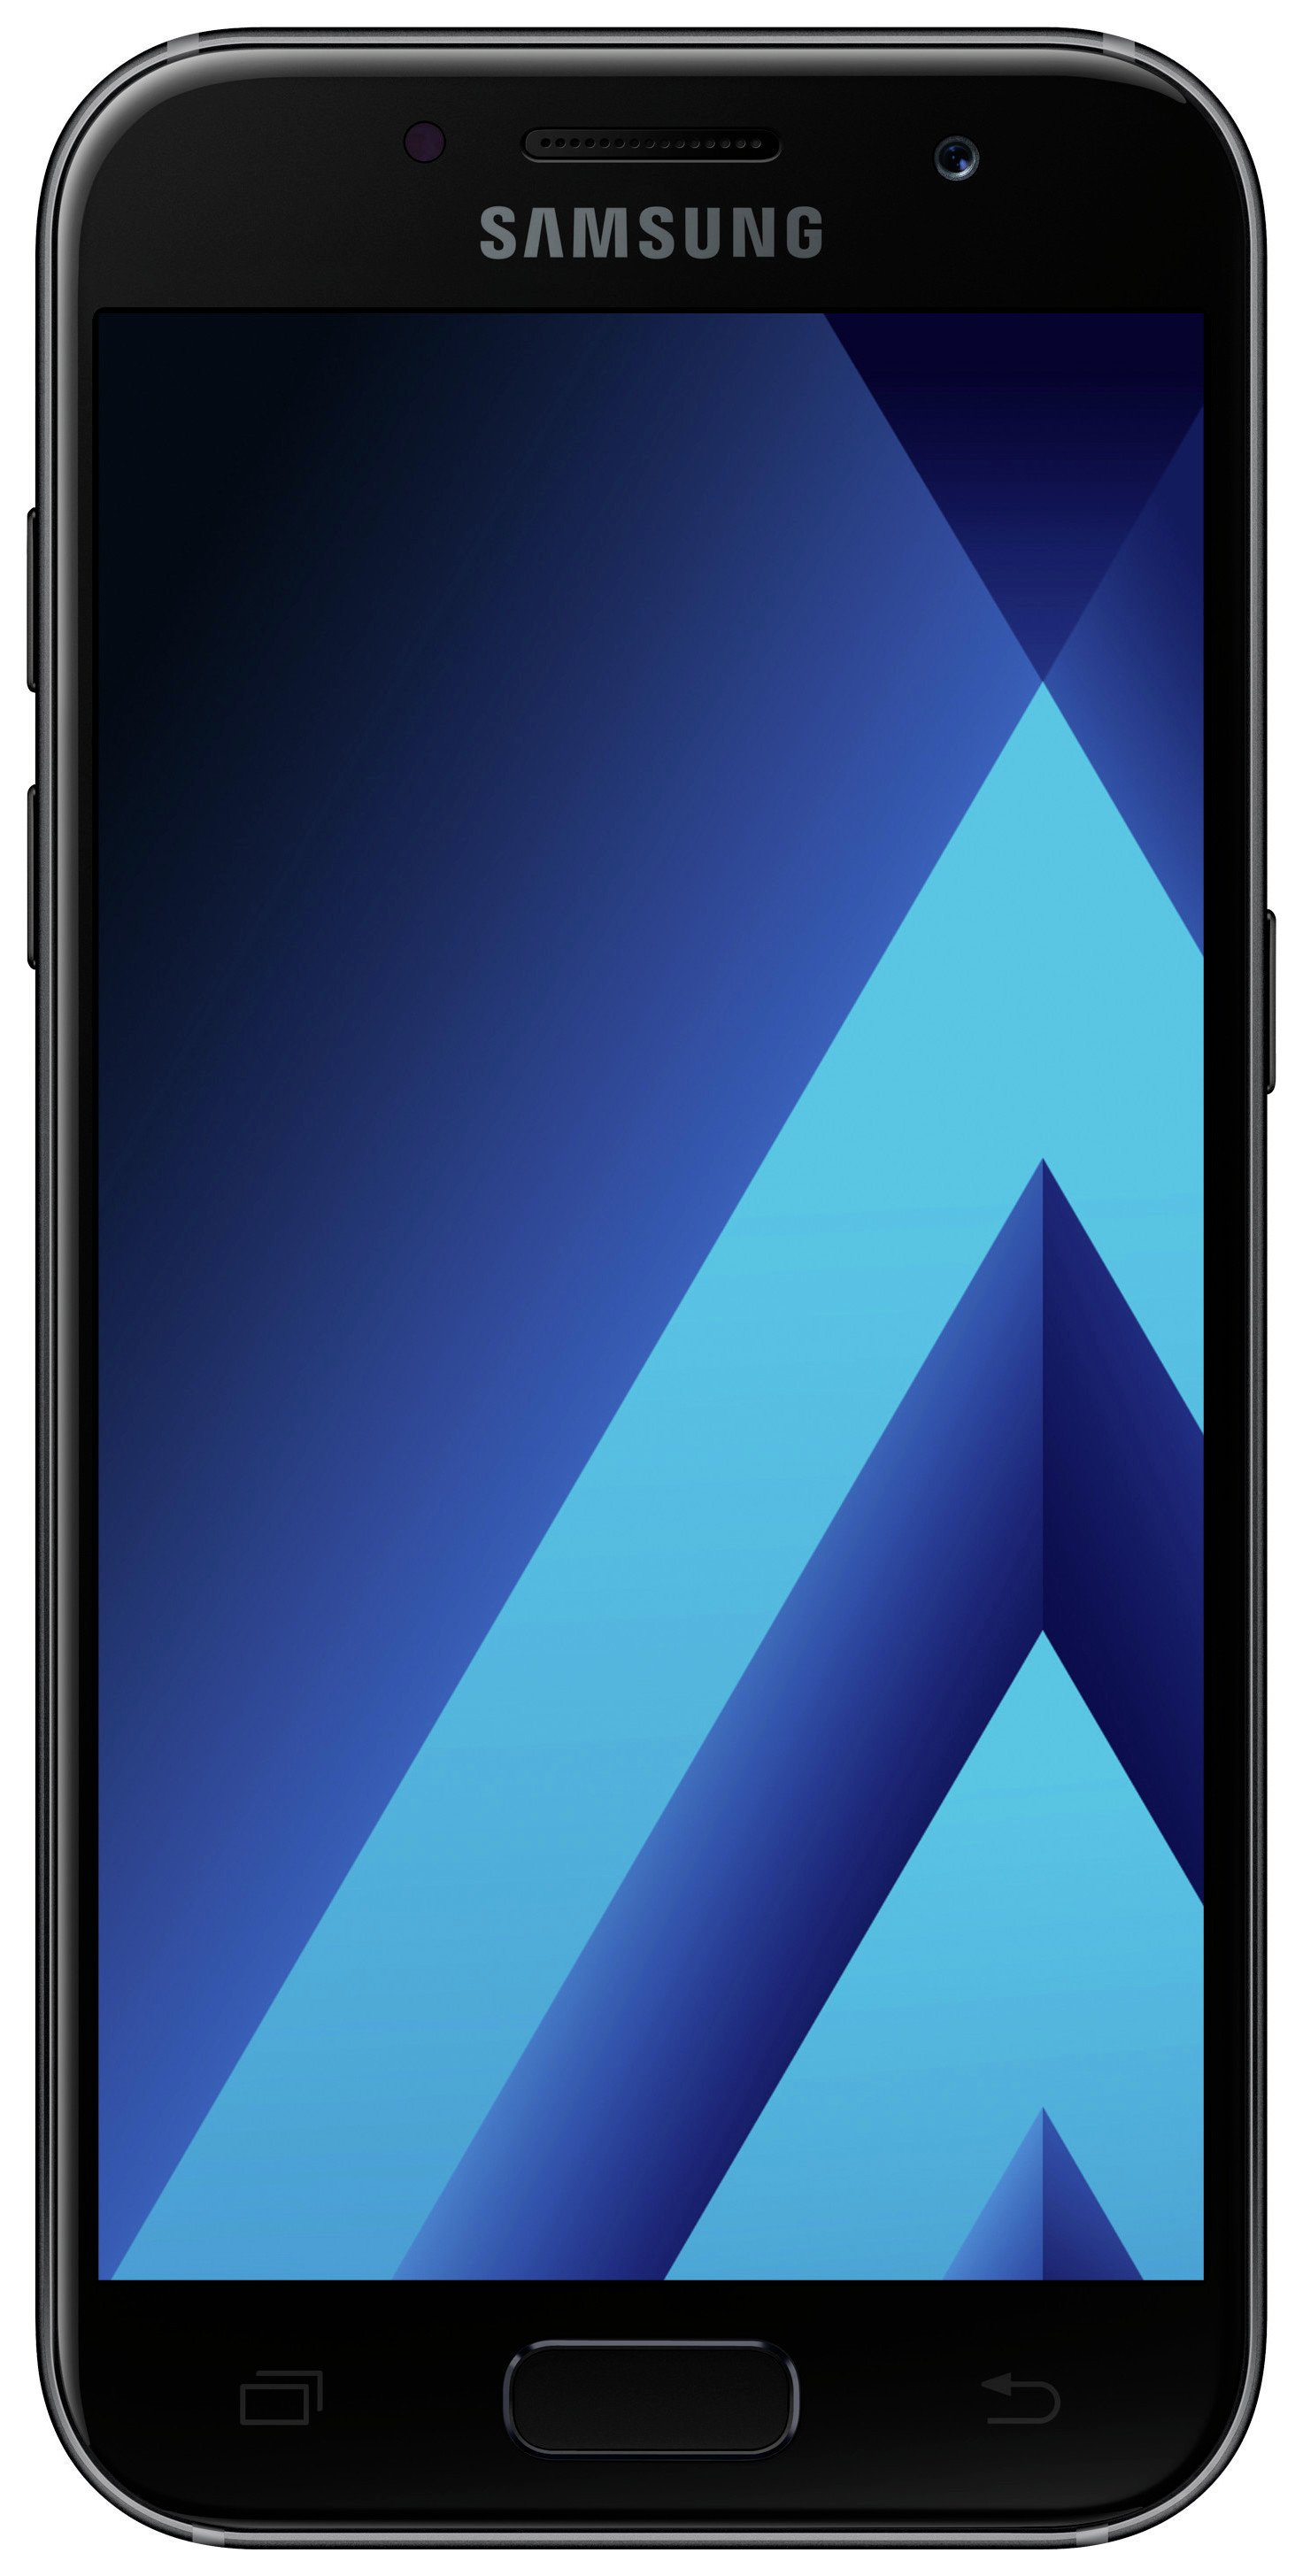 samsung phones 2017. sim free samsung a3 2017 mobile phone - black phones